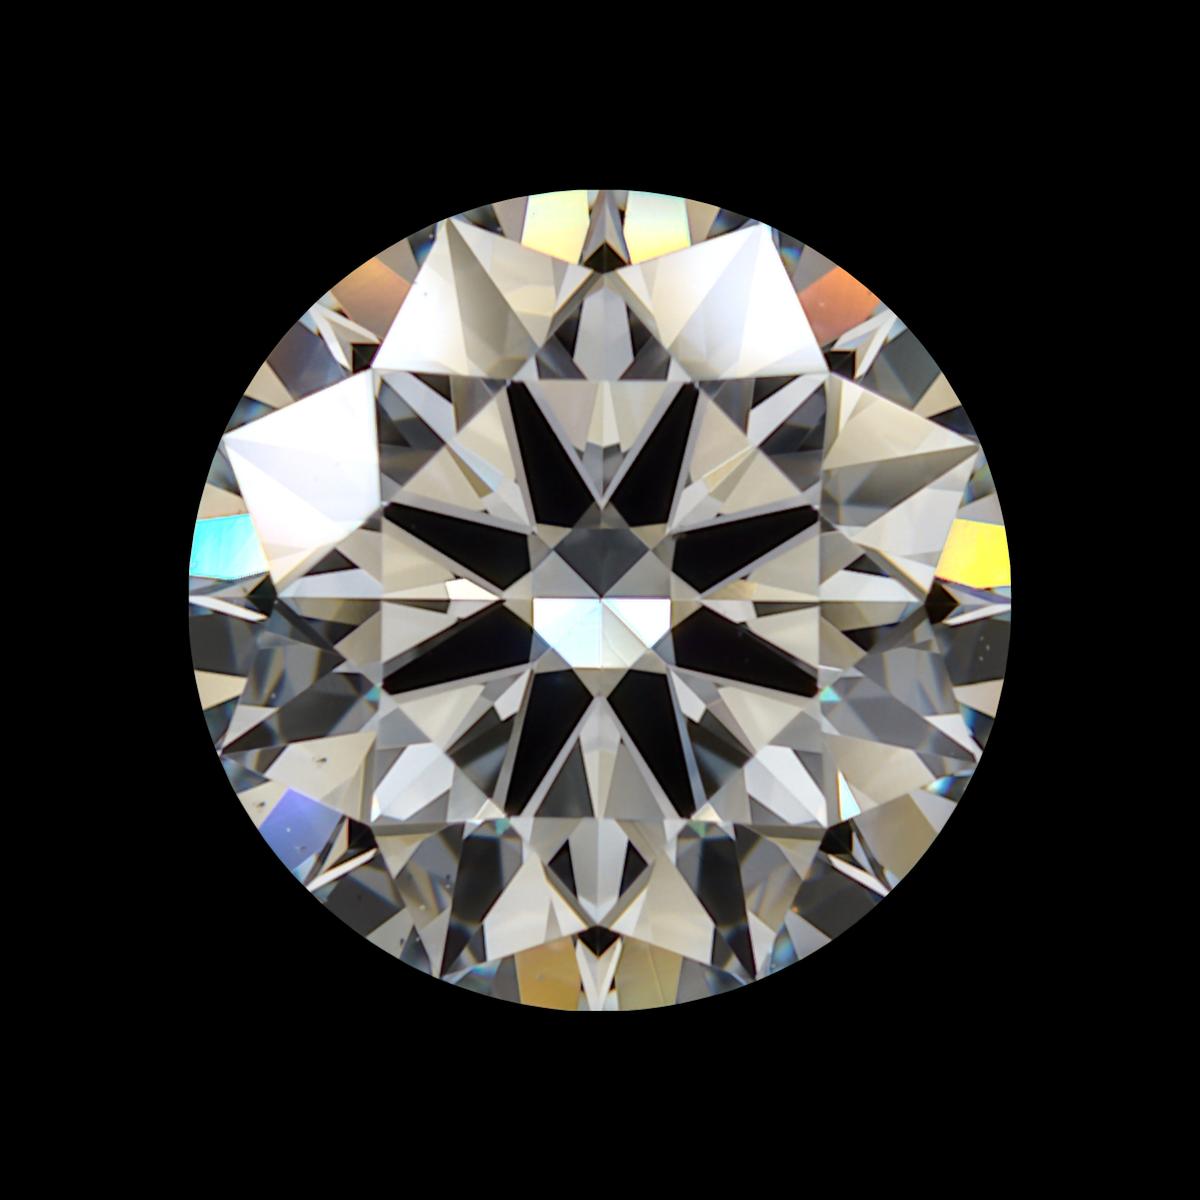 https://cdn.briangavindiamonds.com/files/mp4/BKAGS-104100413010/BKAGS-104100413010-Office-02.mp4